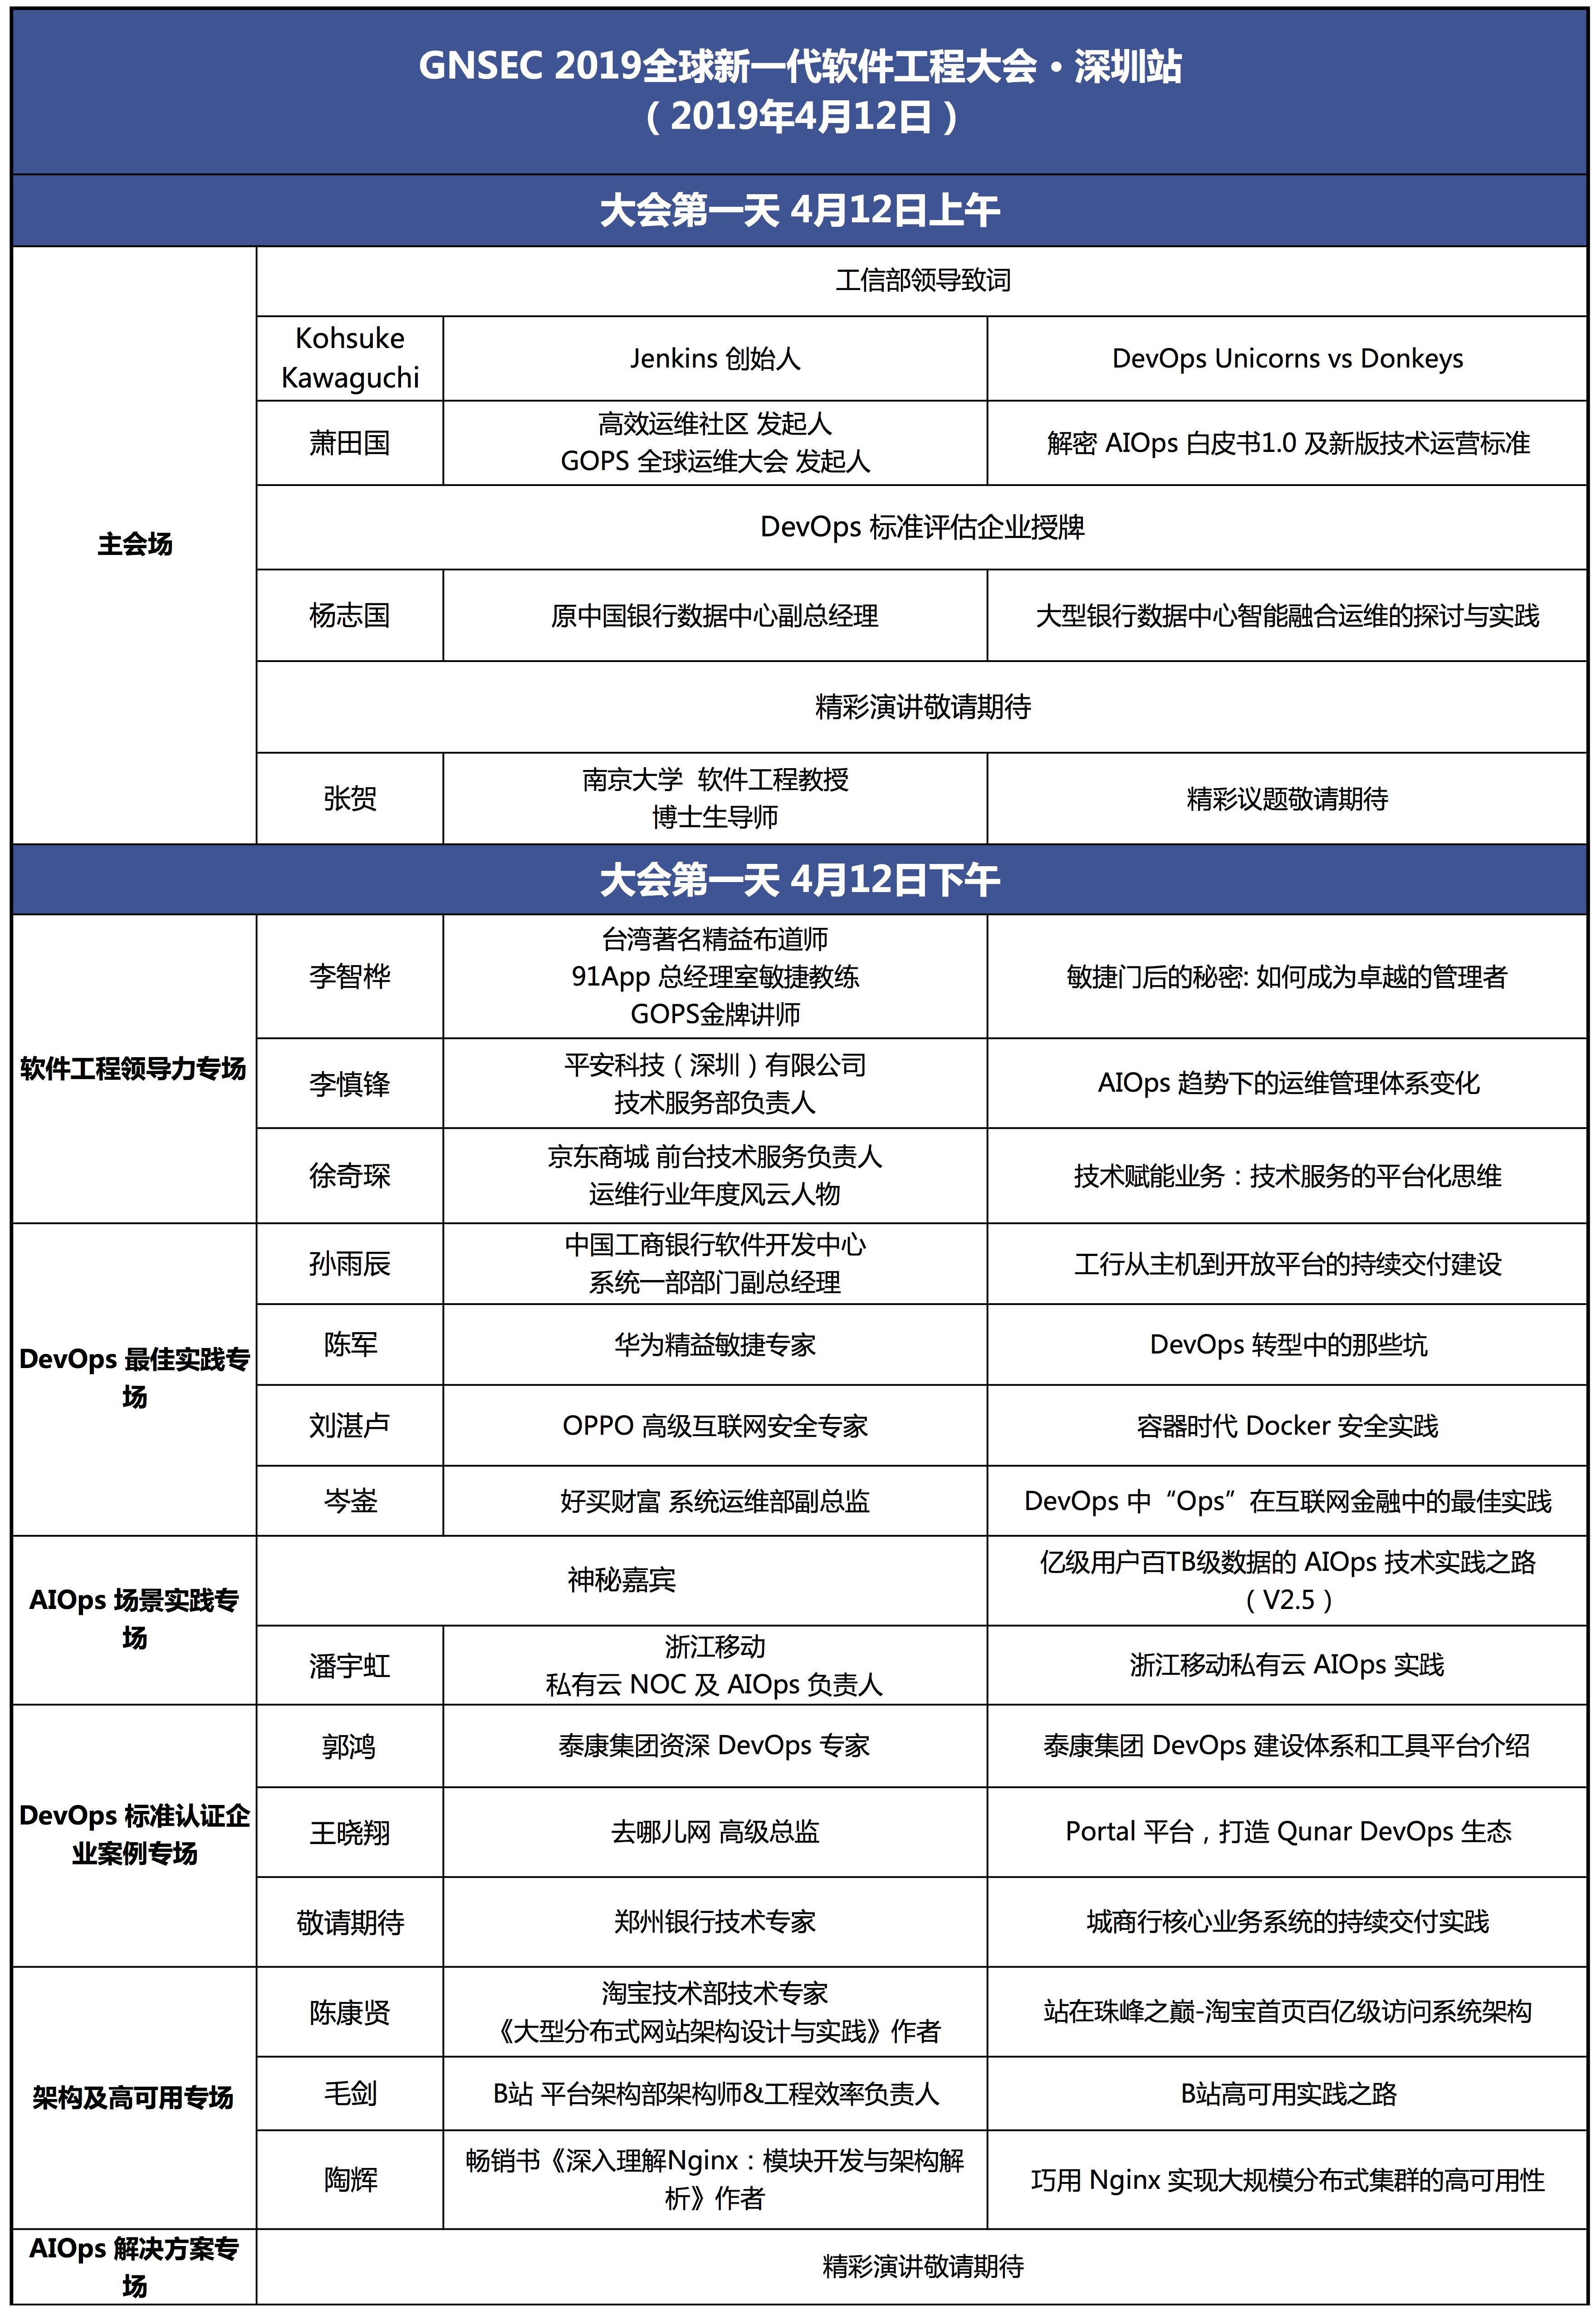 GOPS 19 深圳大会 -1.28.png